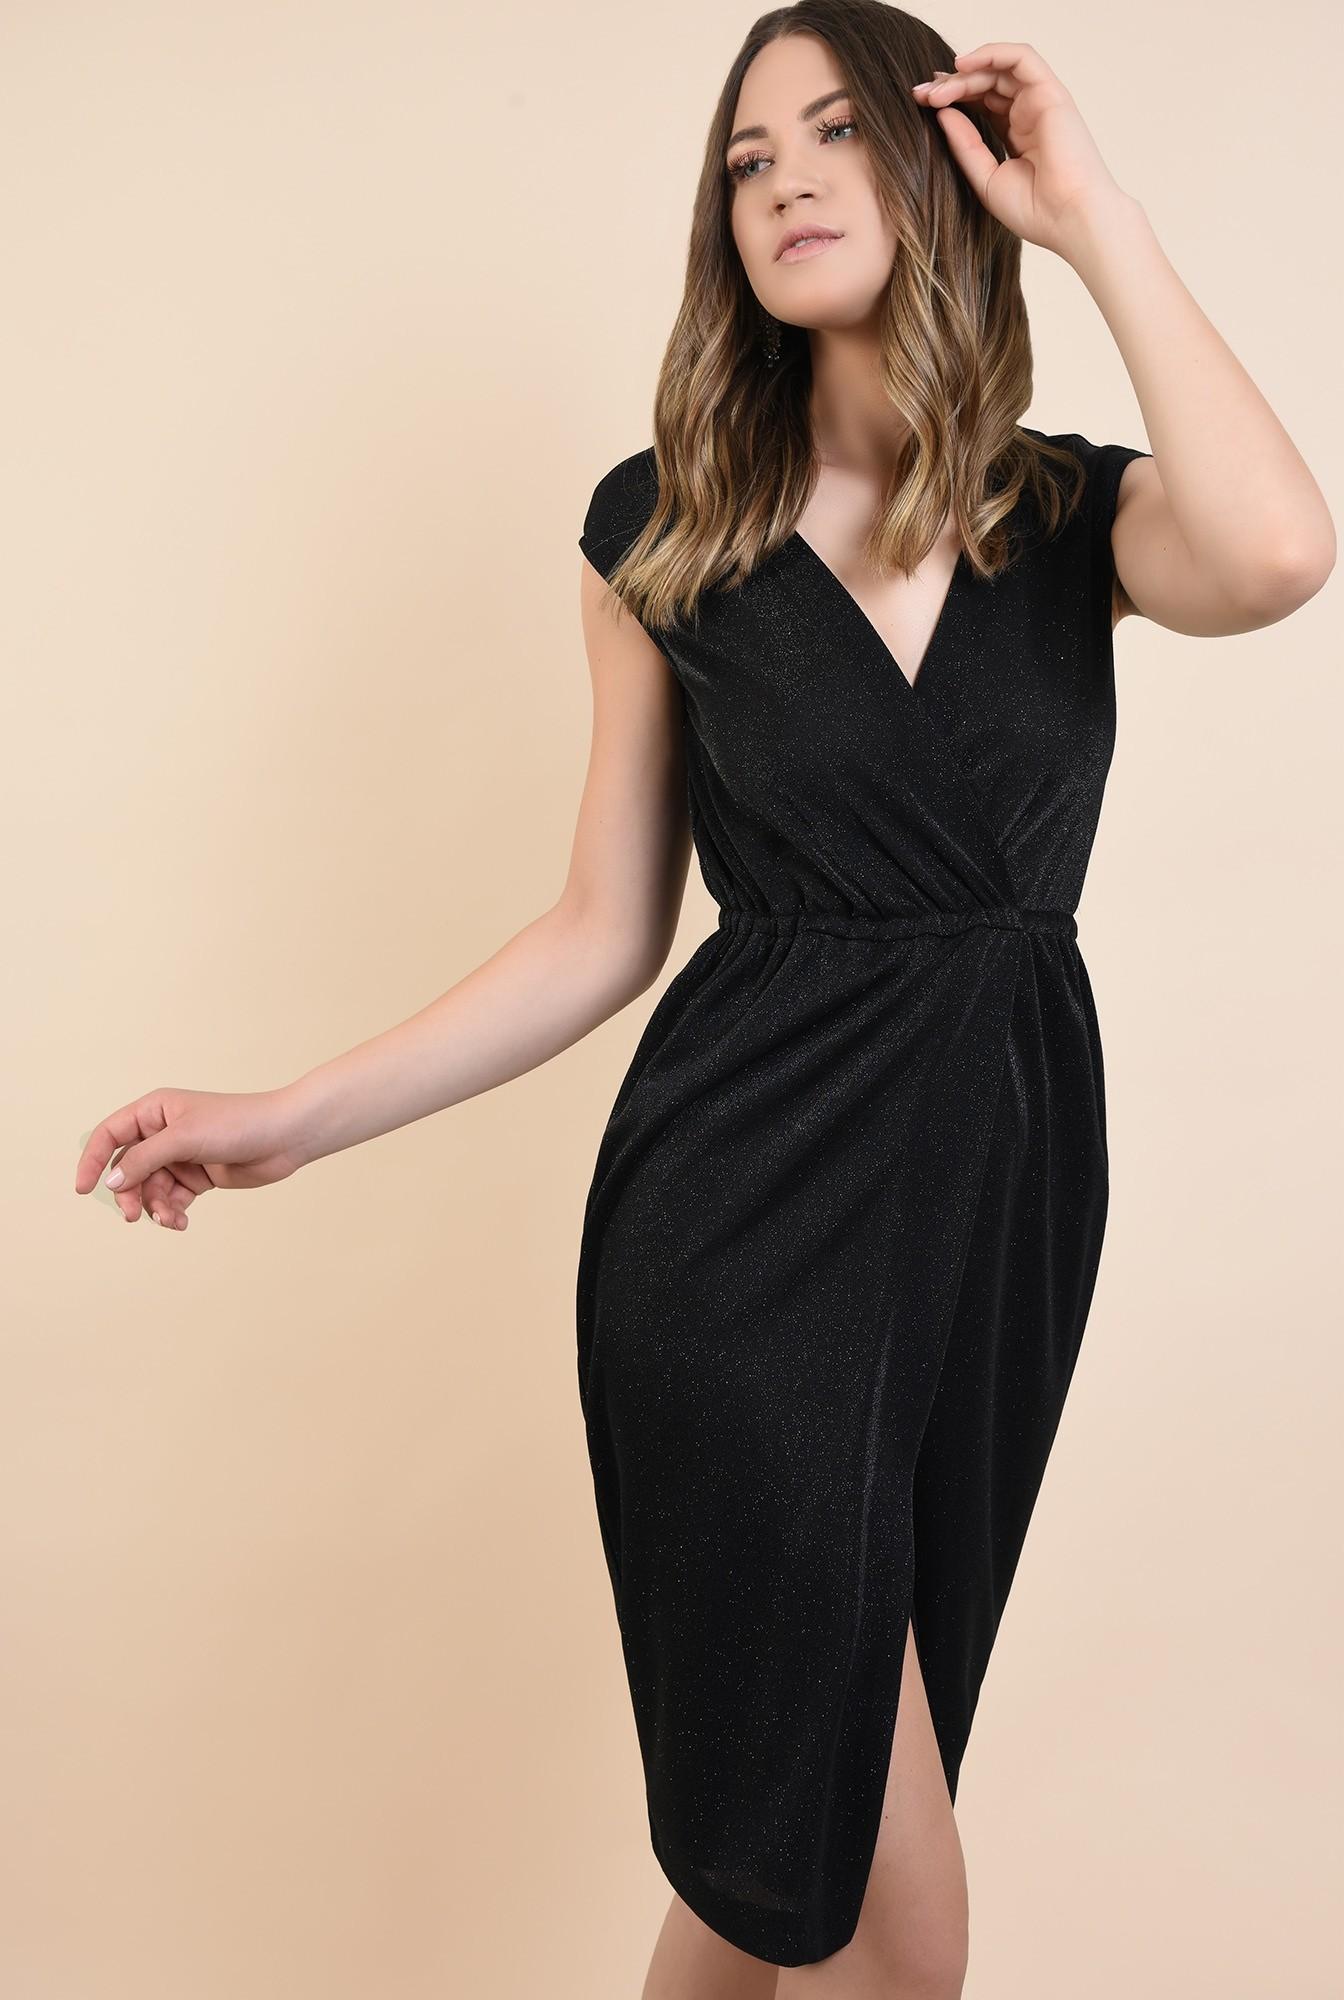 0 - 360 - rochie de ocazie, midi, petrecuta, spate gol, lurex, cu sclipici